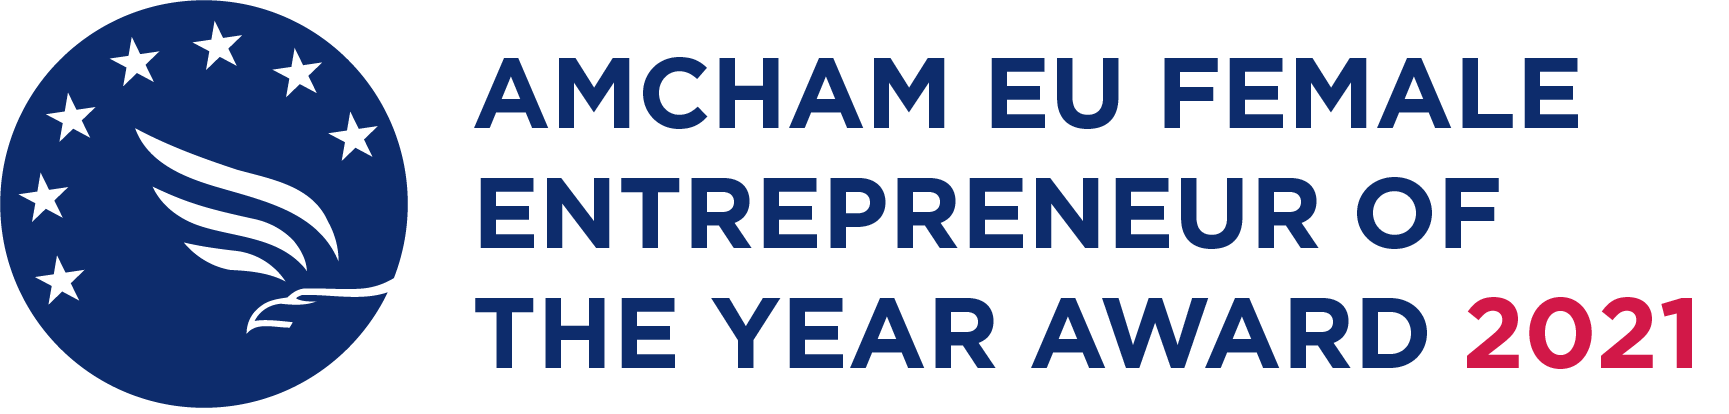 Entrepreneur of the Year Award 2021